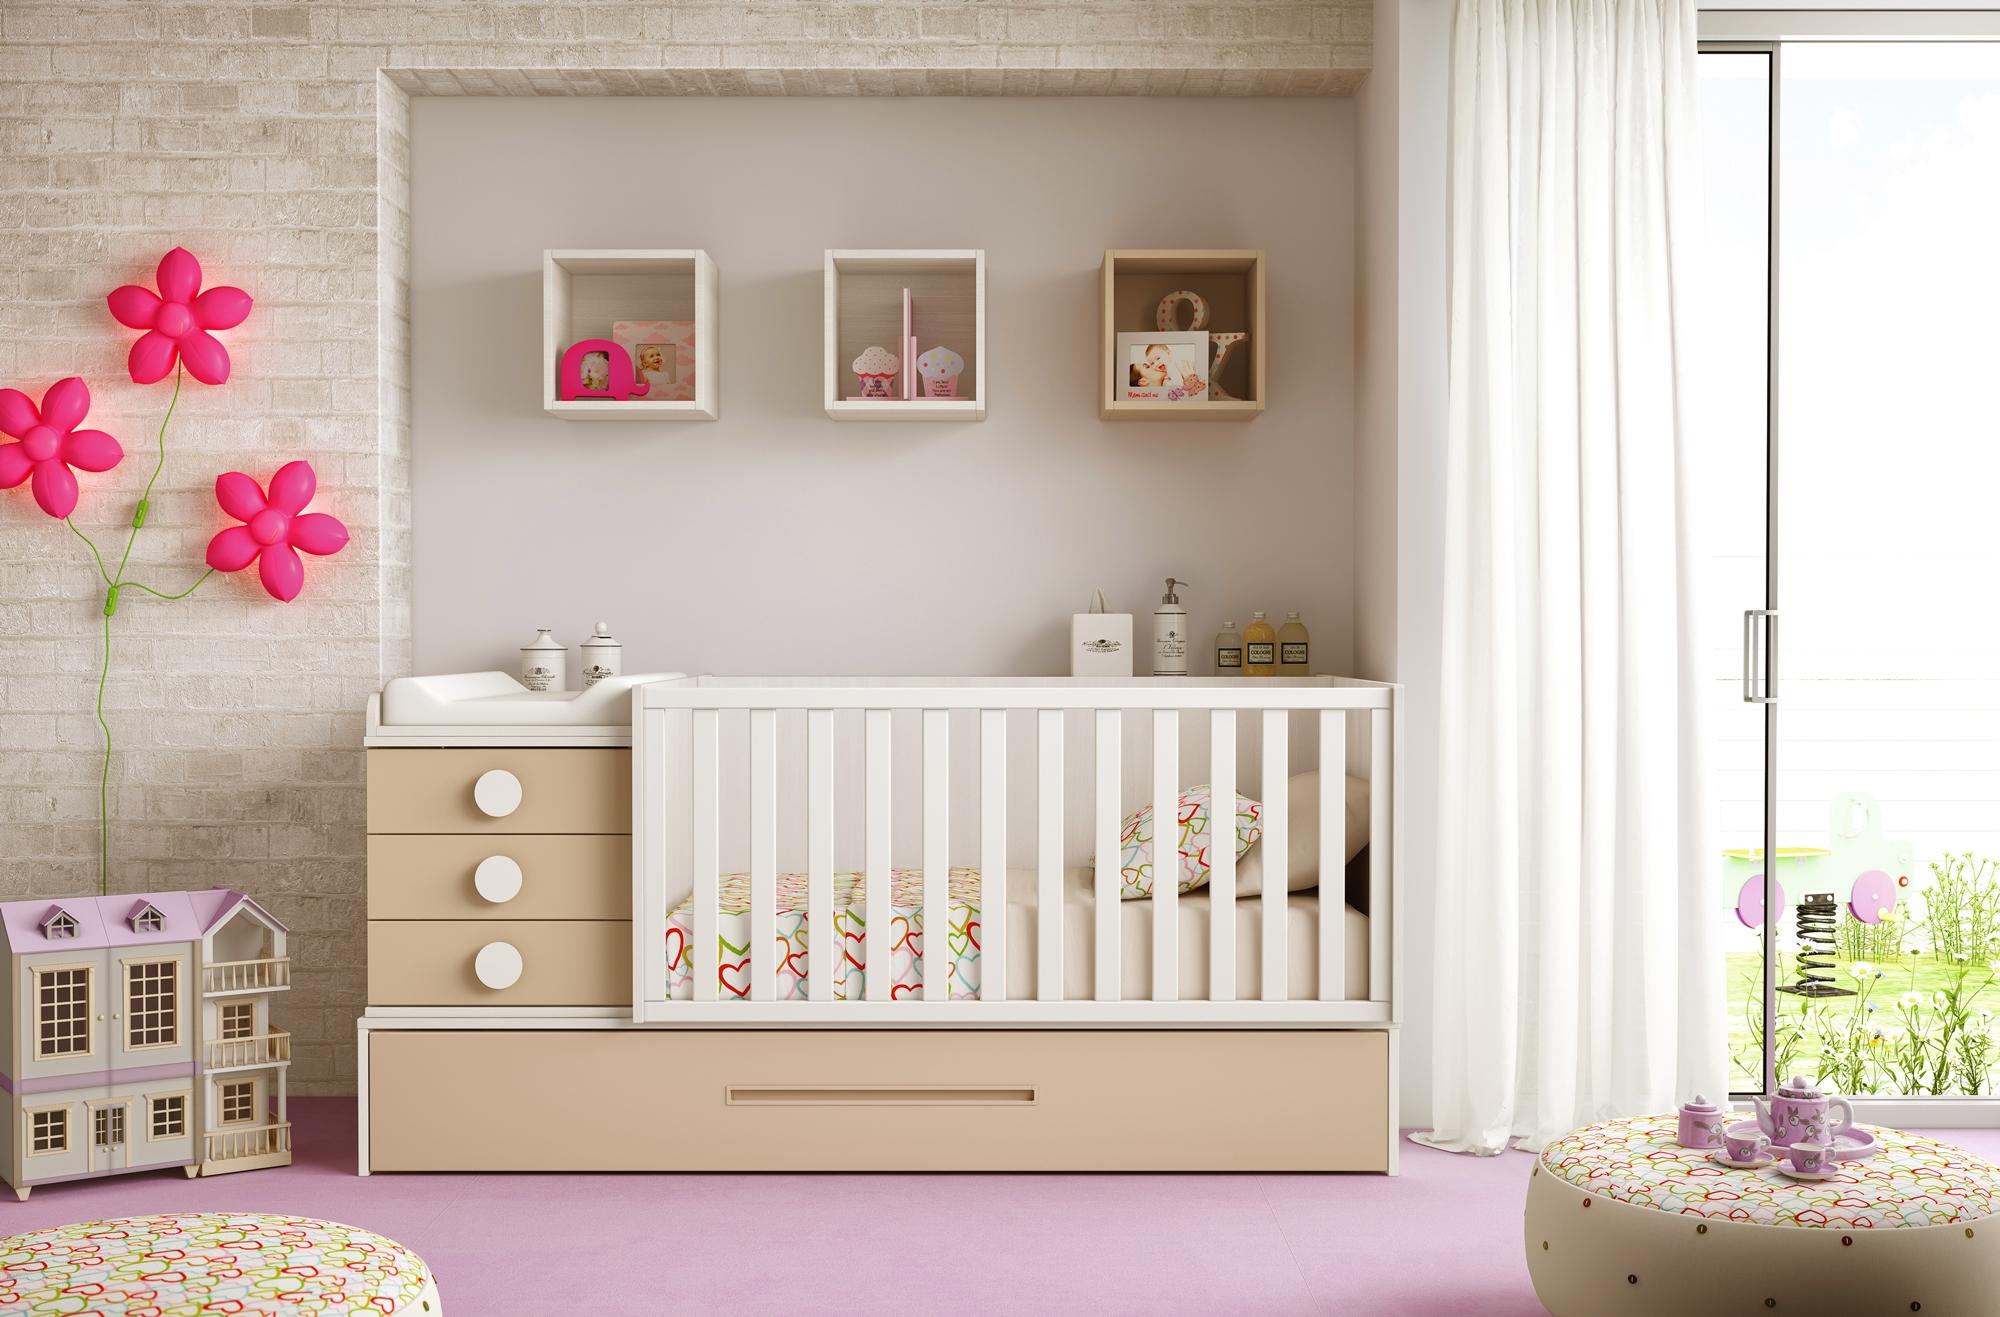 Lit pour b b lc19 pour la chambre b b volutive for Lit bebe pour petite chambre